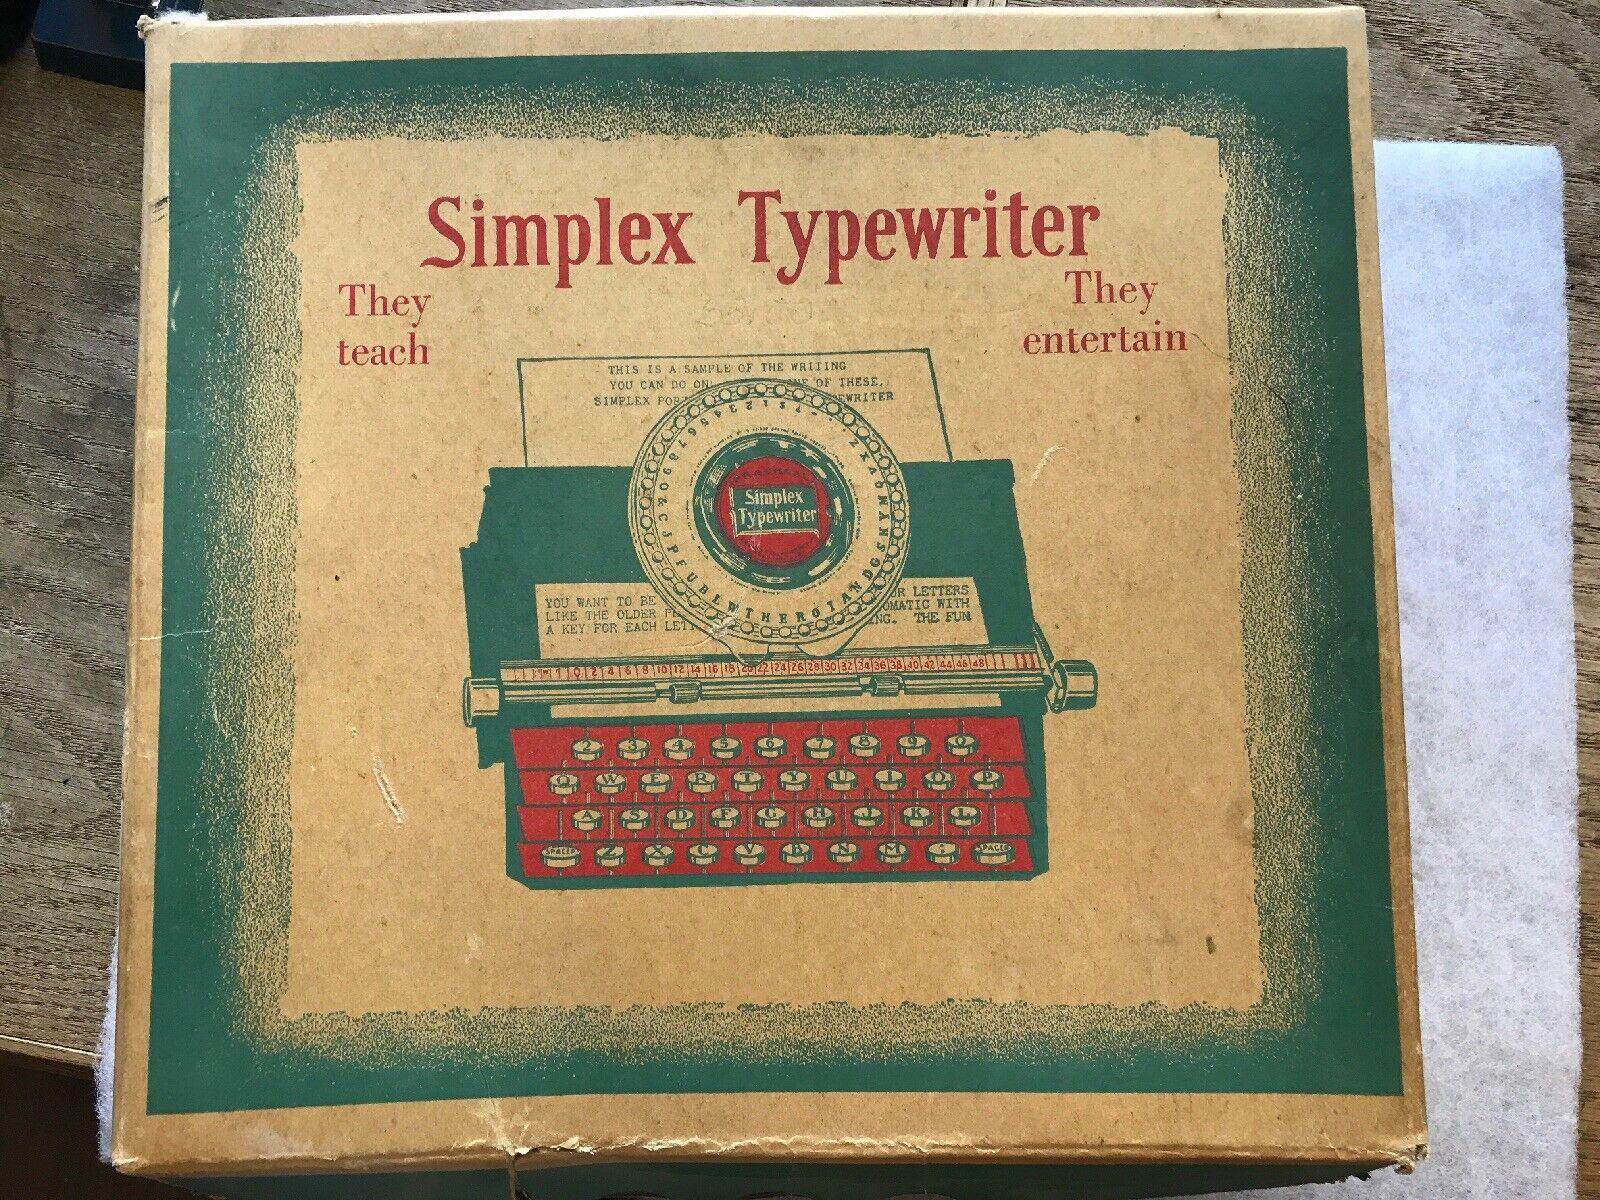 ofreciendo 100% Máquina de escribir Simplex Tin Tin Tin número 300, alrojoedor de 1915 en Caja Original  muchas concesiones